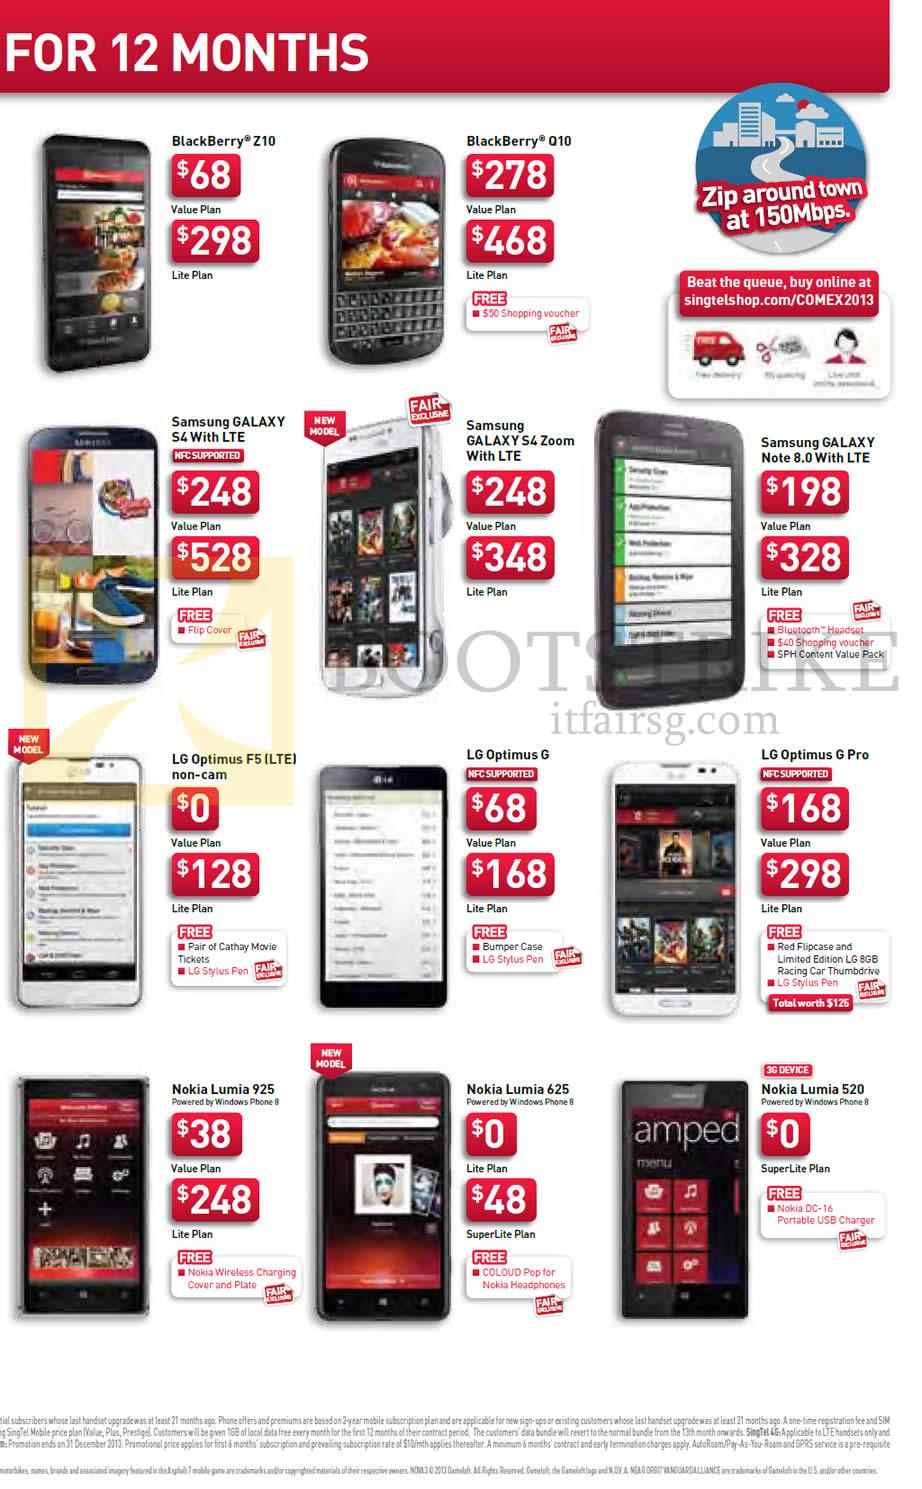 COMEX 2013 Price List Image Brochure Of Singtel Mobile Blackberry Z10 Q10 Samsung Galaxy